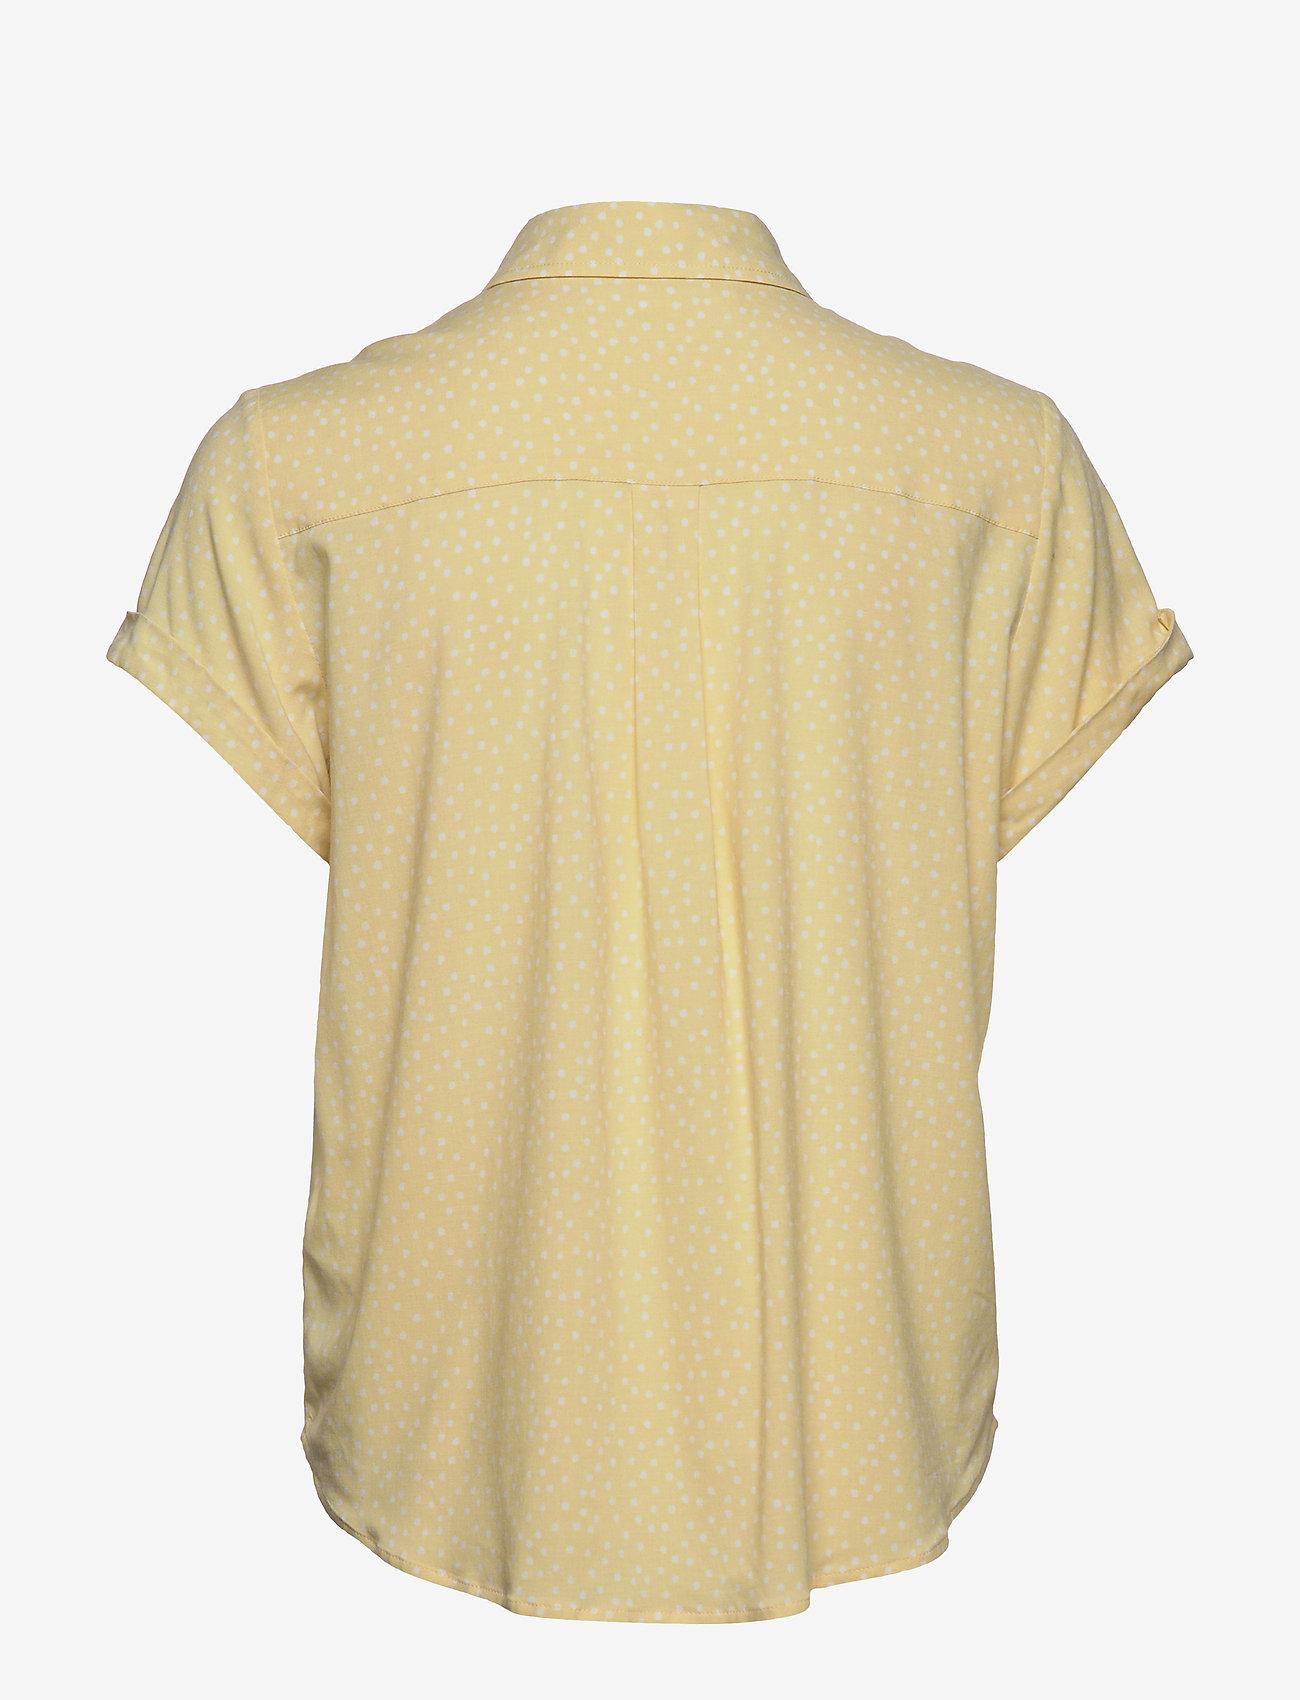 Samsøe Samsøe - Majan ss shirt aop 9942 - overhemden met korte mouwen - summer drops - 1